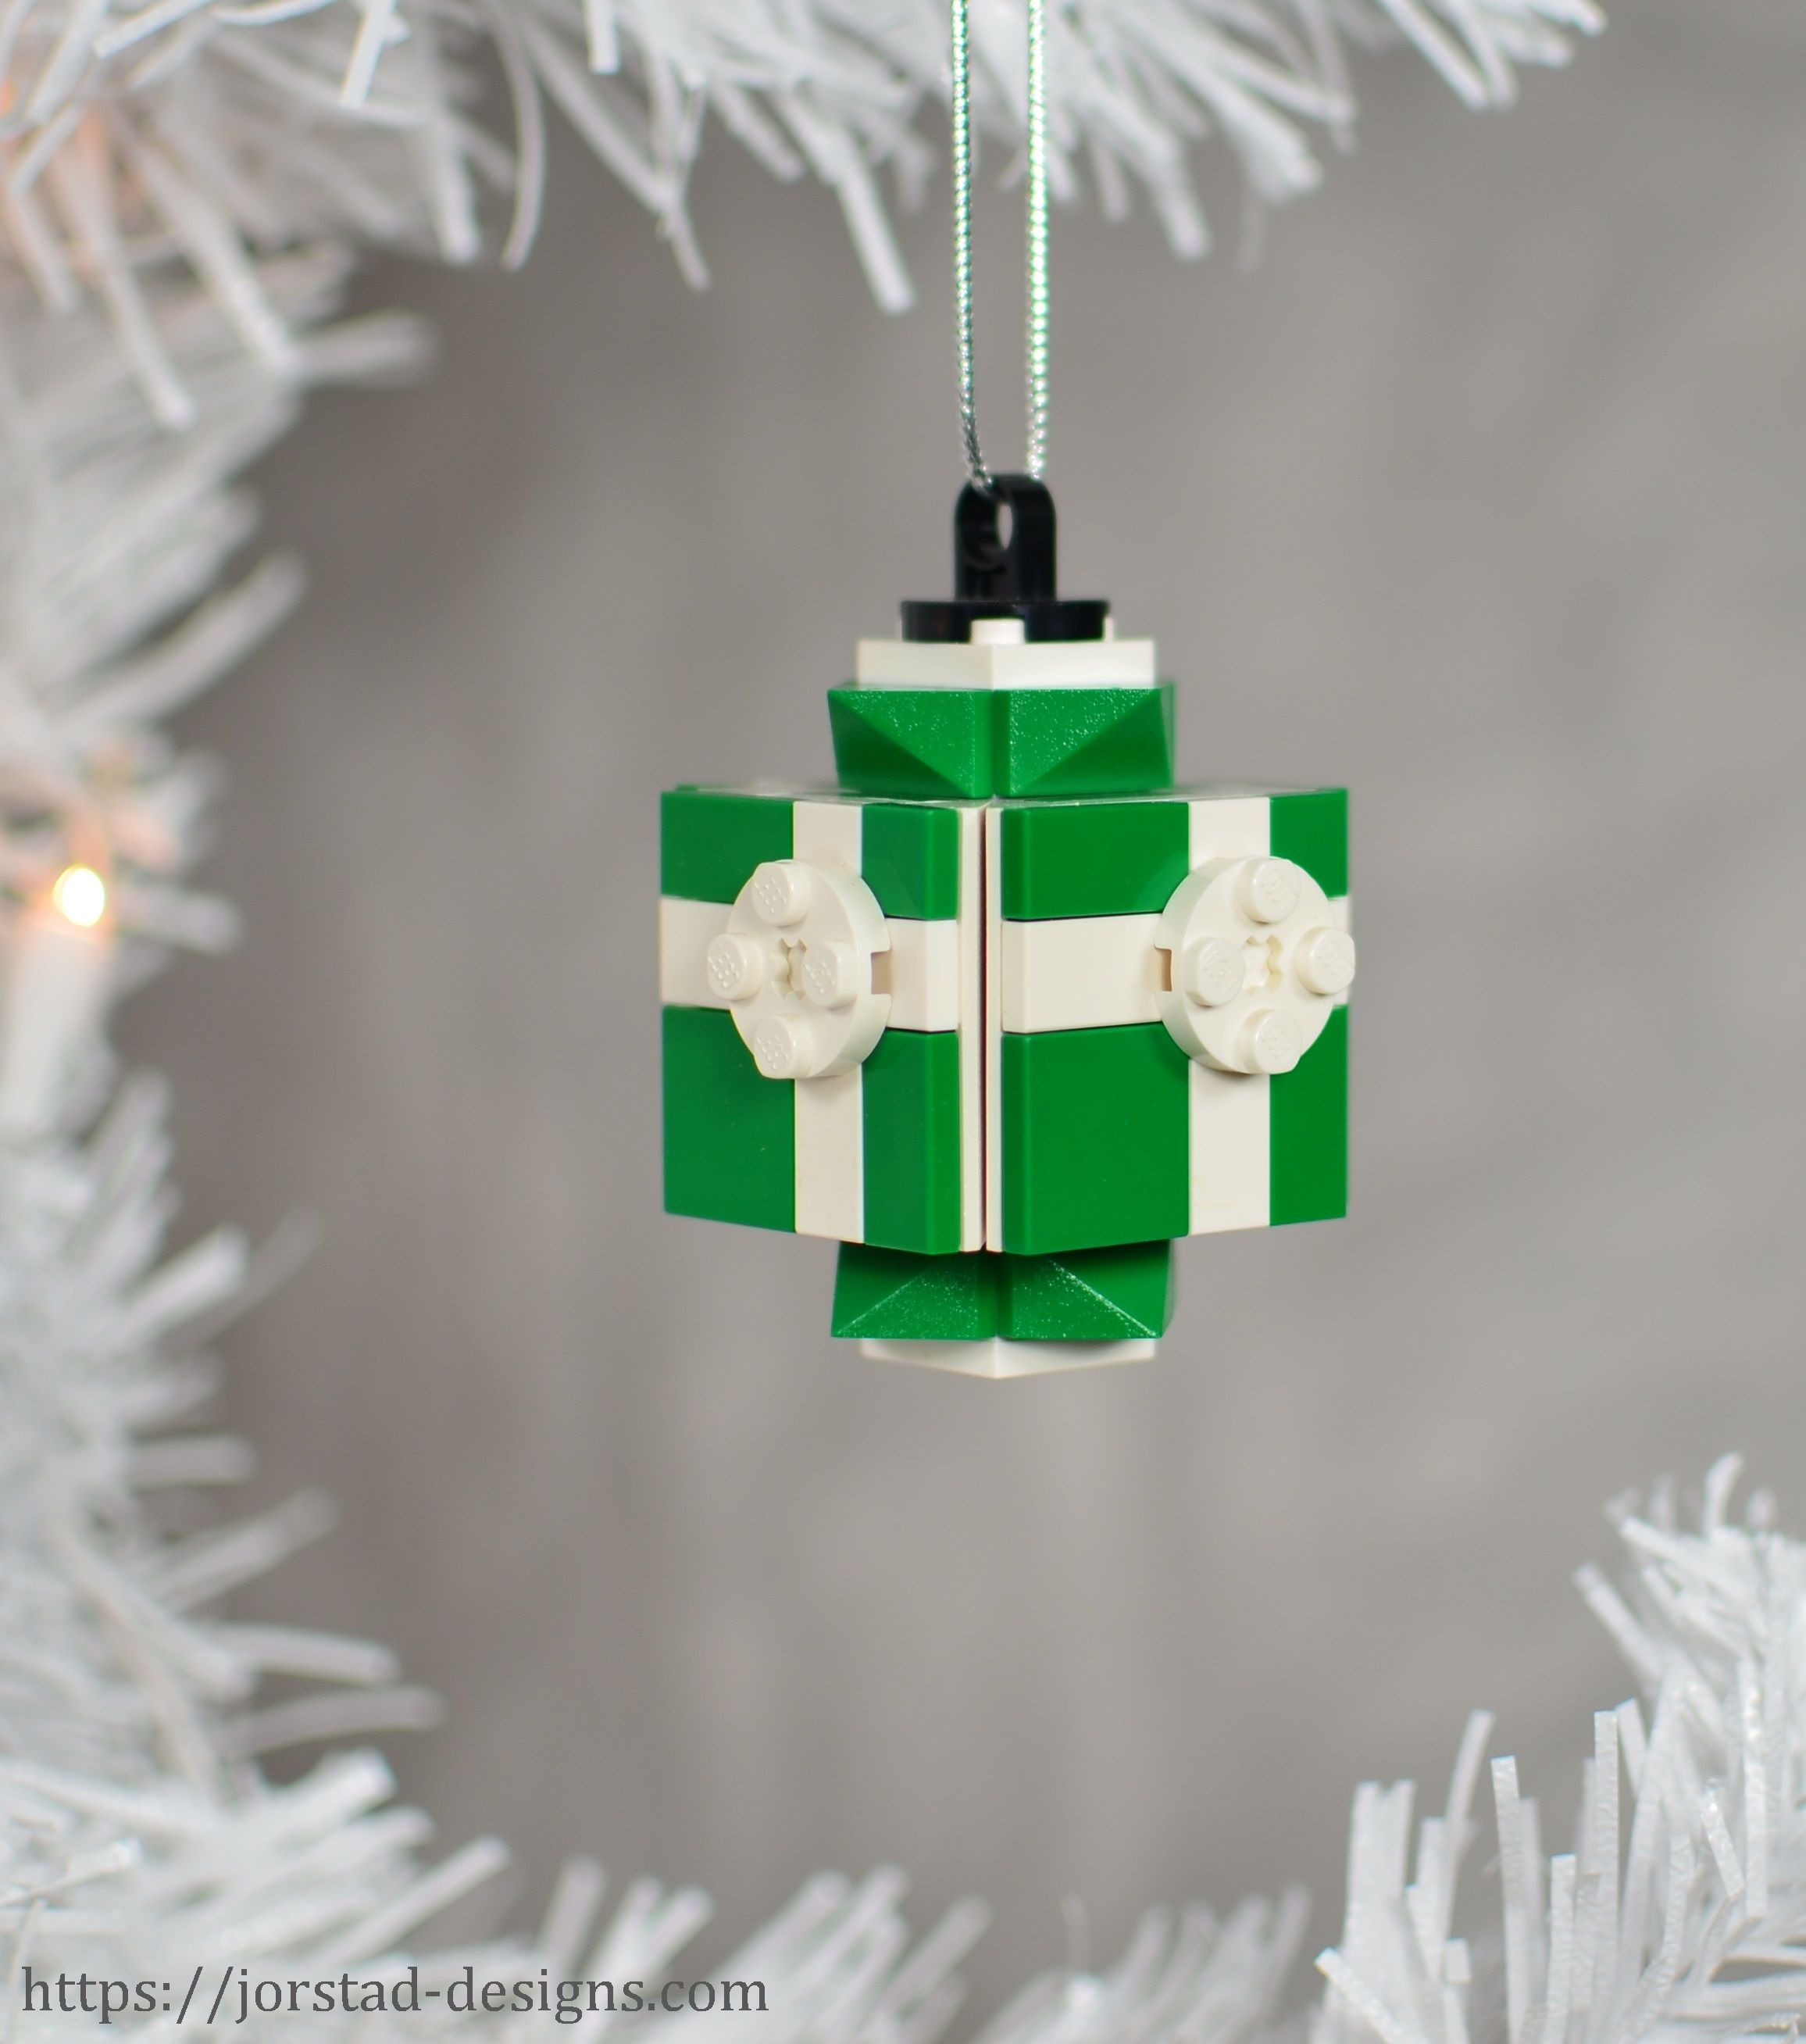 Lego box shop lego christmas ornaments at jorstaddesigns